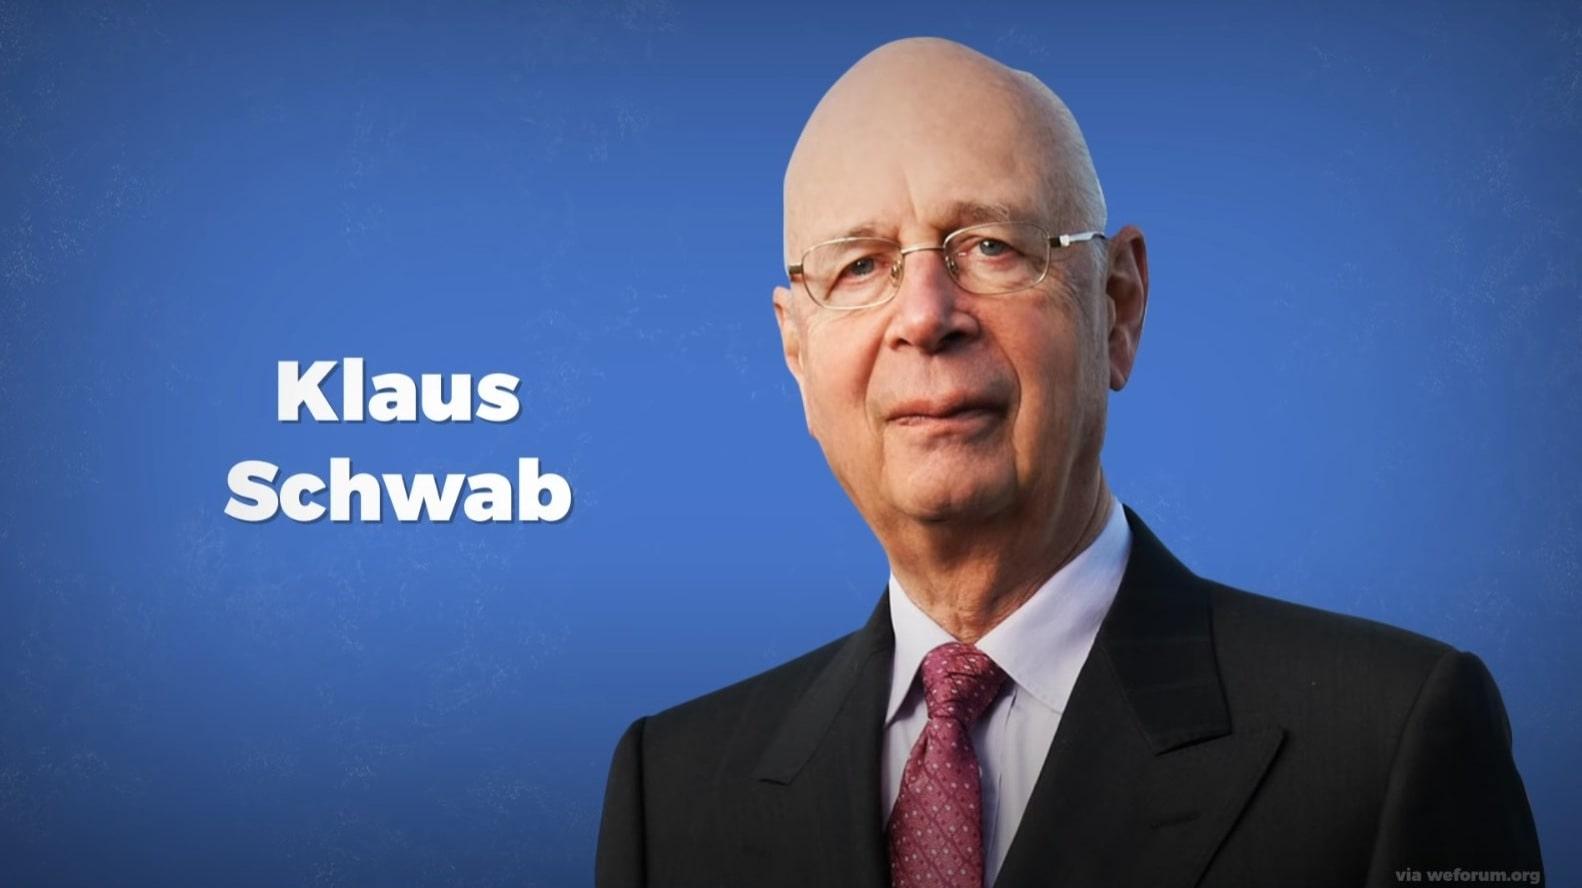 klaus_schwab